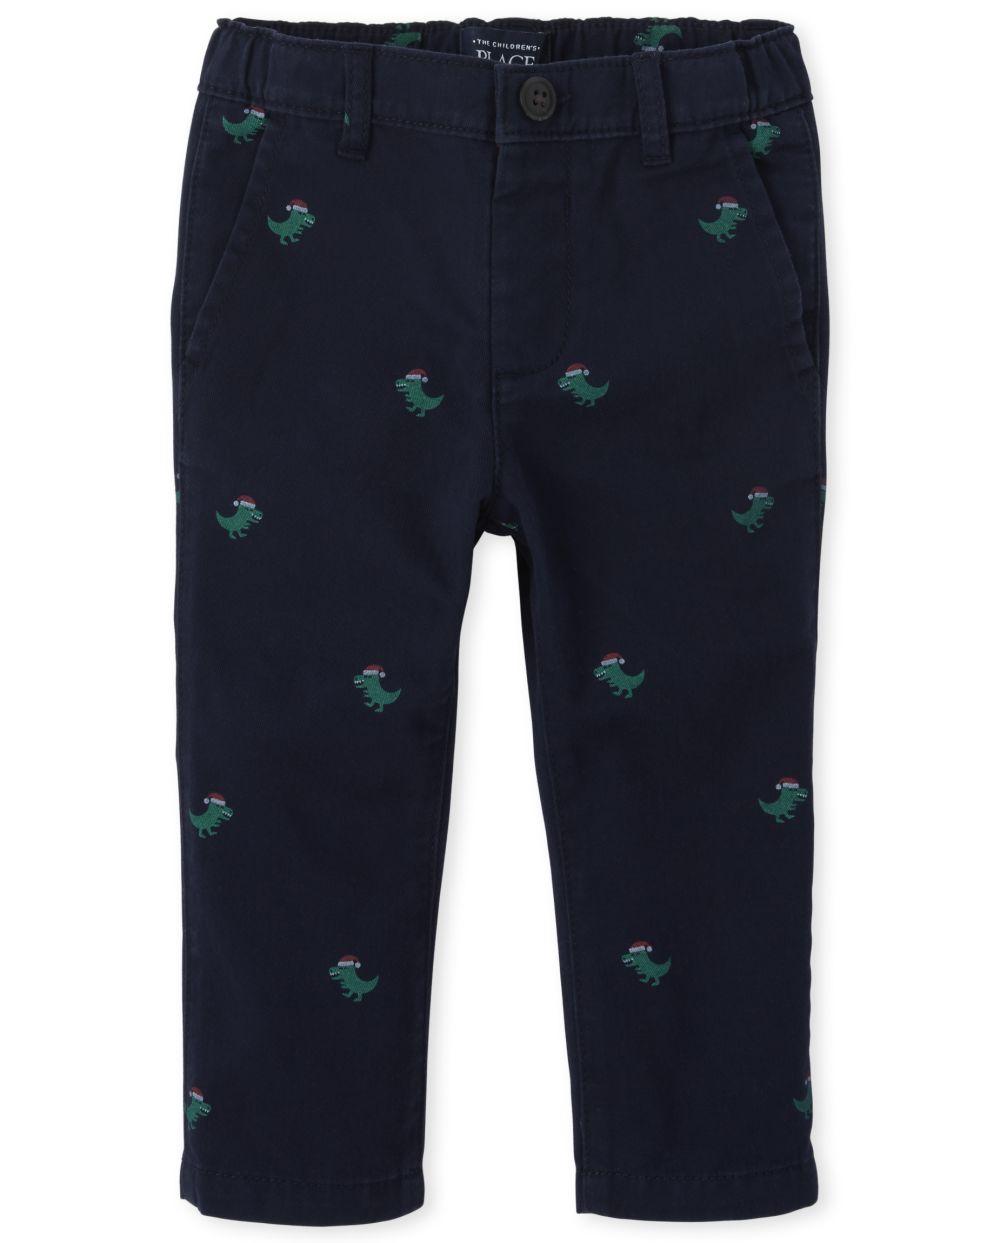 Toddler And Boys Merry Rex-Mas Chino Pants